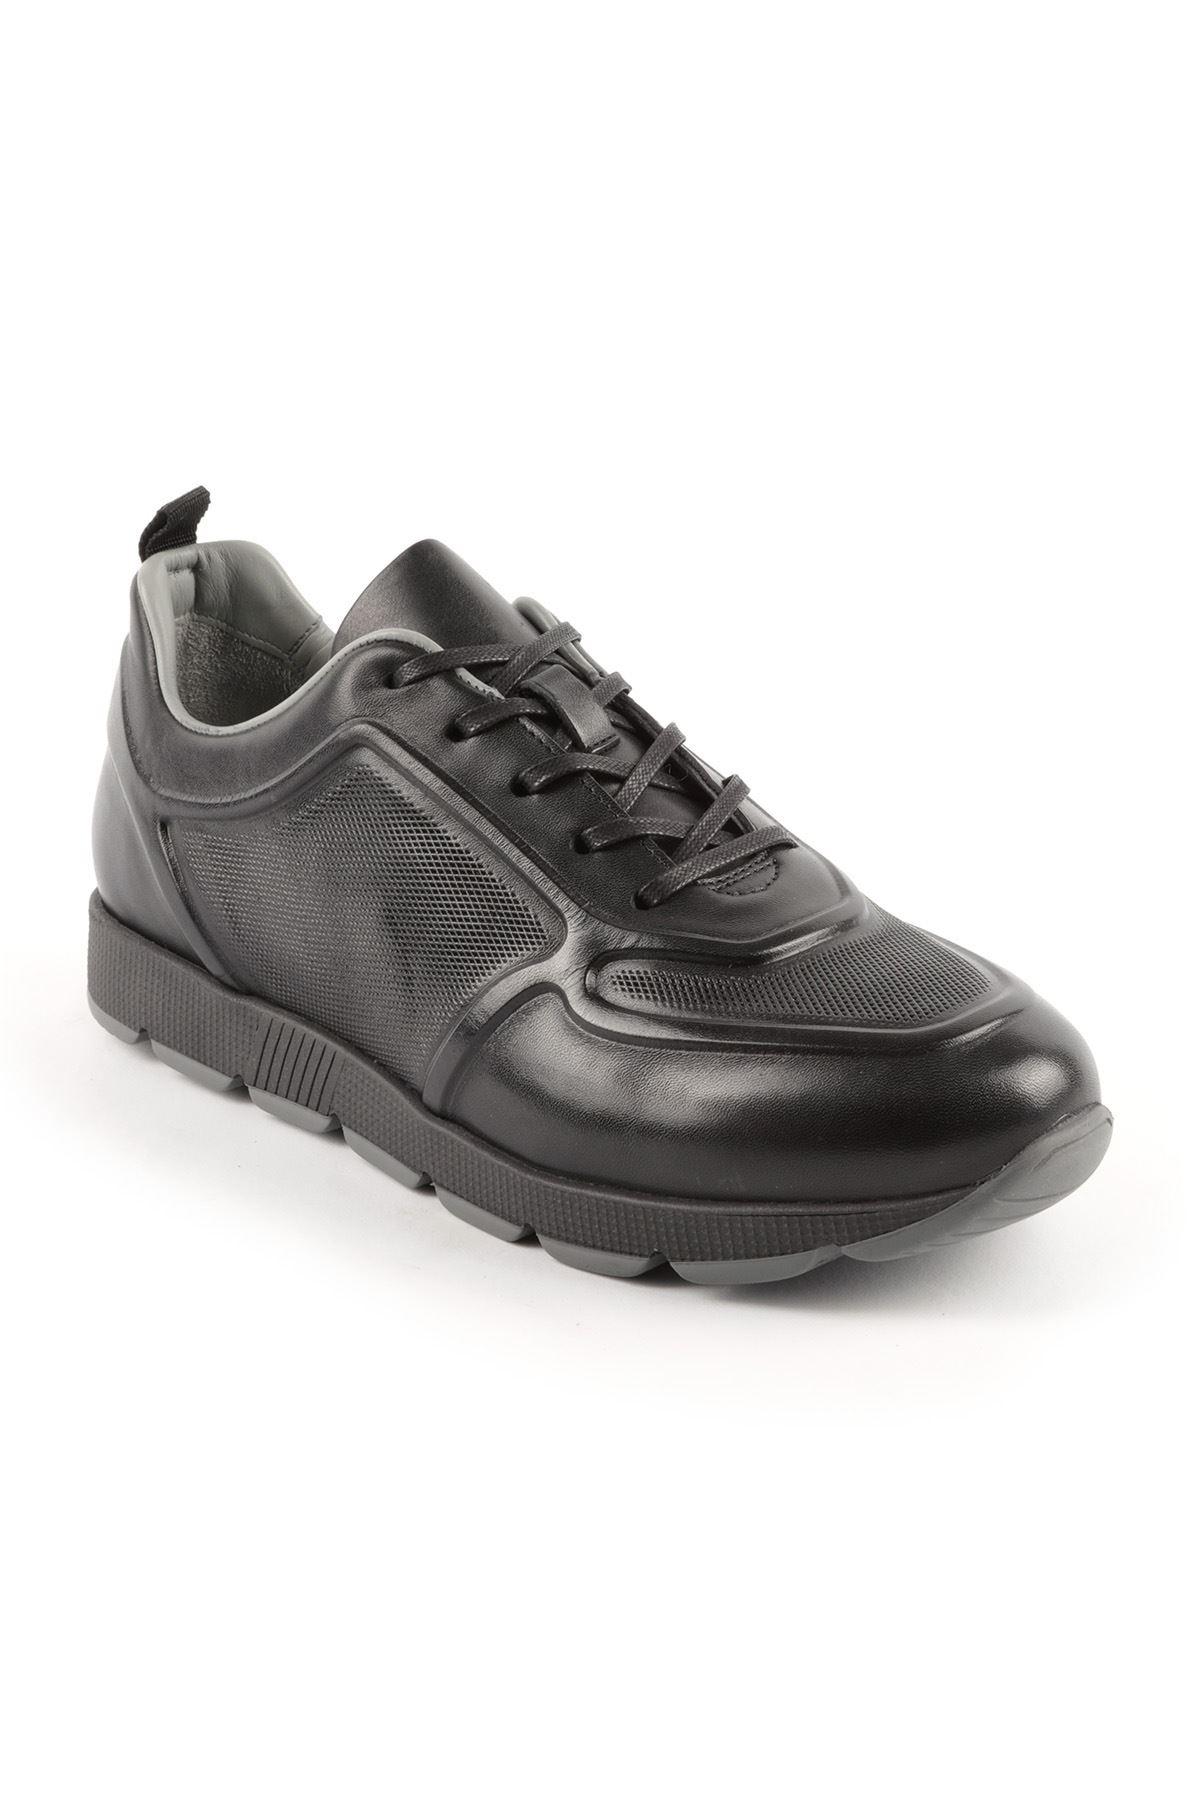 Libero L3497 EA Siyah Erkek Ayakkabı